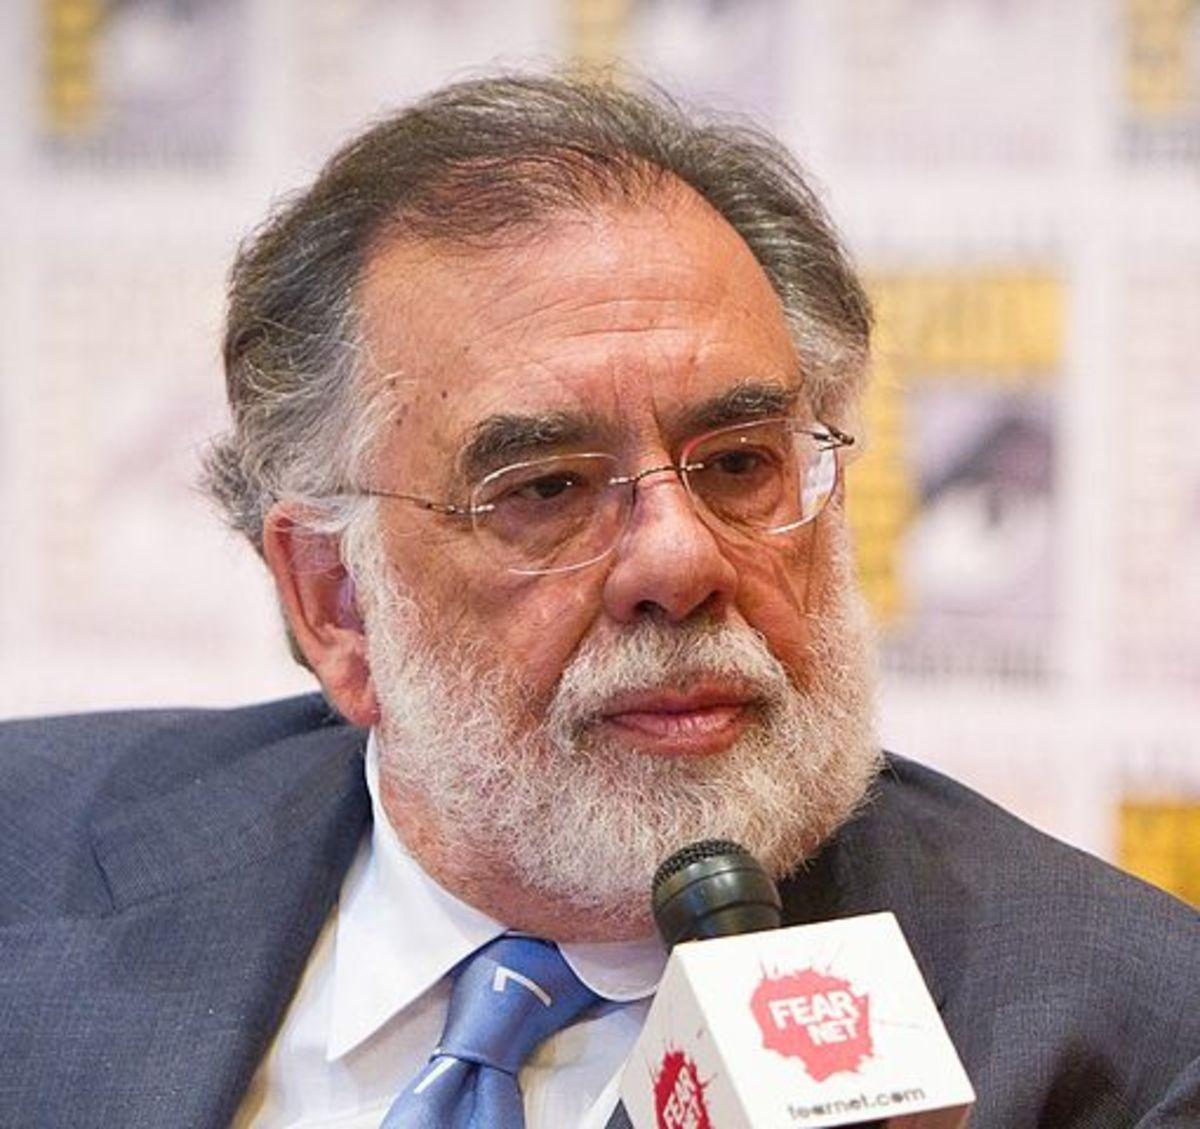 Francis Ford Coppola, 2011